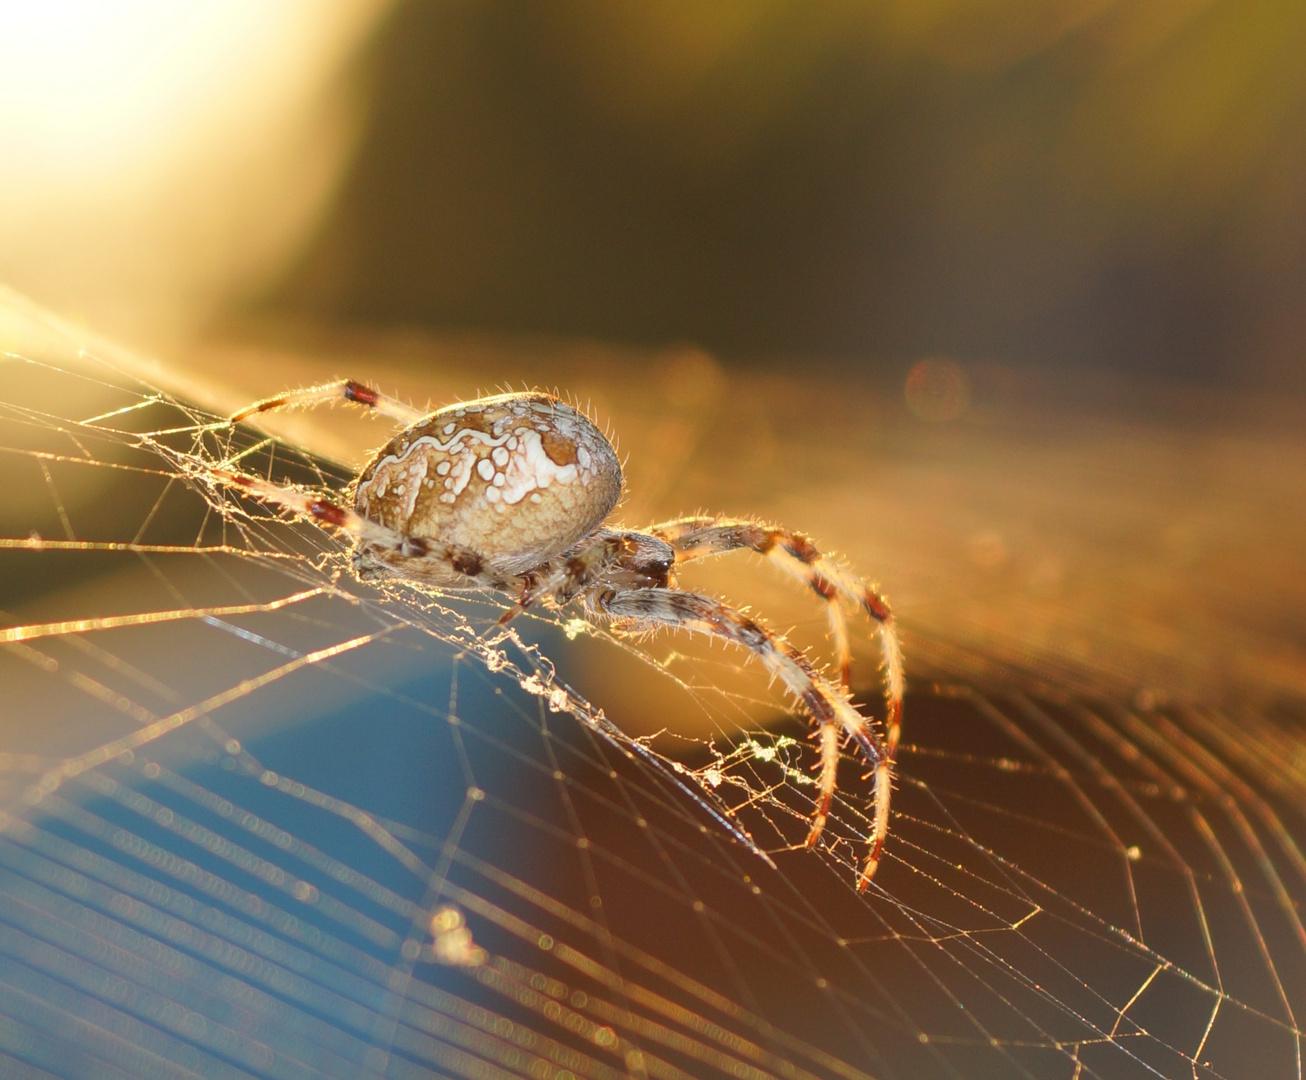 Araña de la cruz. Araneus Diadematus. European garden spider. Cross spider .Cross orbweaver.